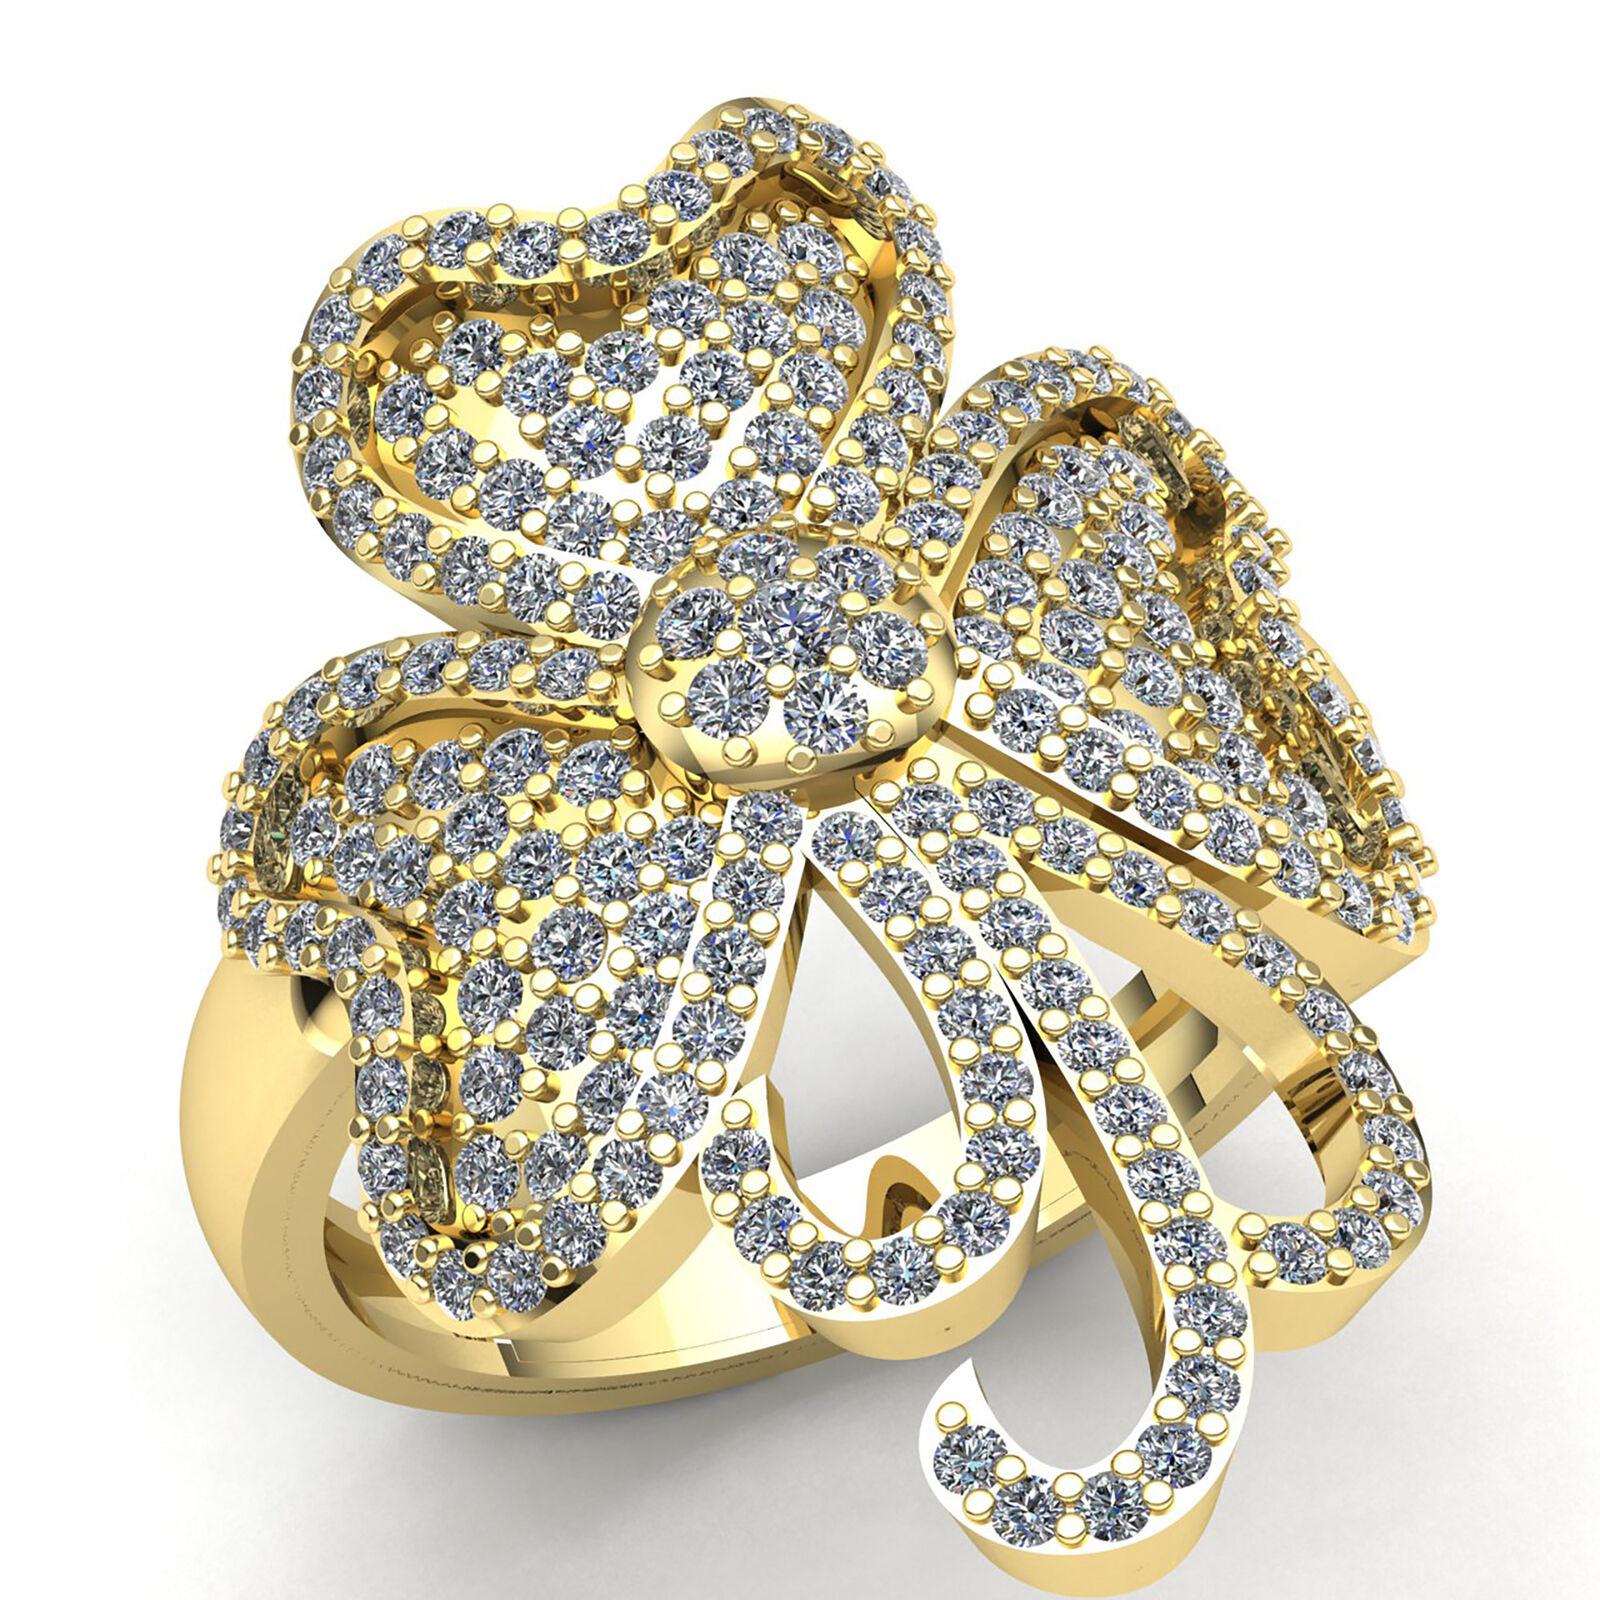 Genuine 1ctw Round Diamond Ladies Cluster Flower Fancy Engagement Ring 14K gold